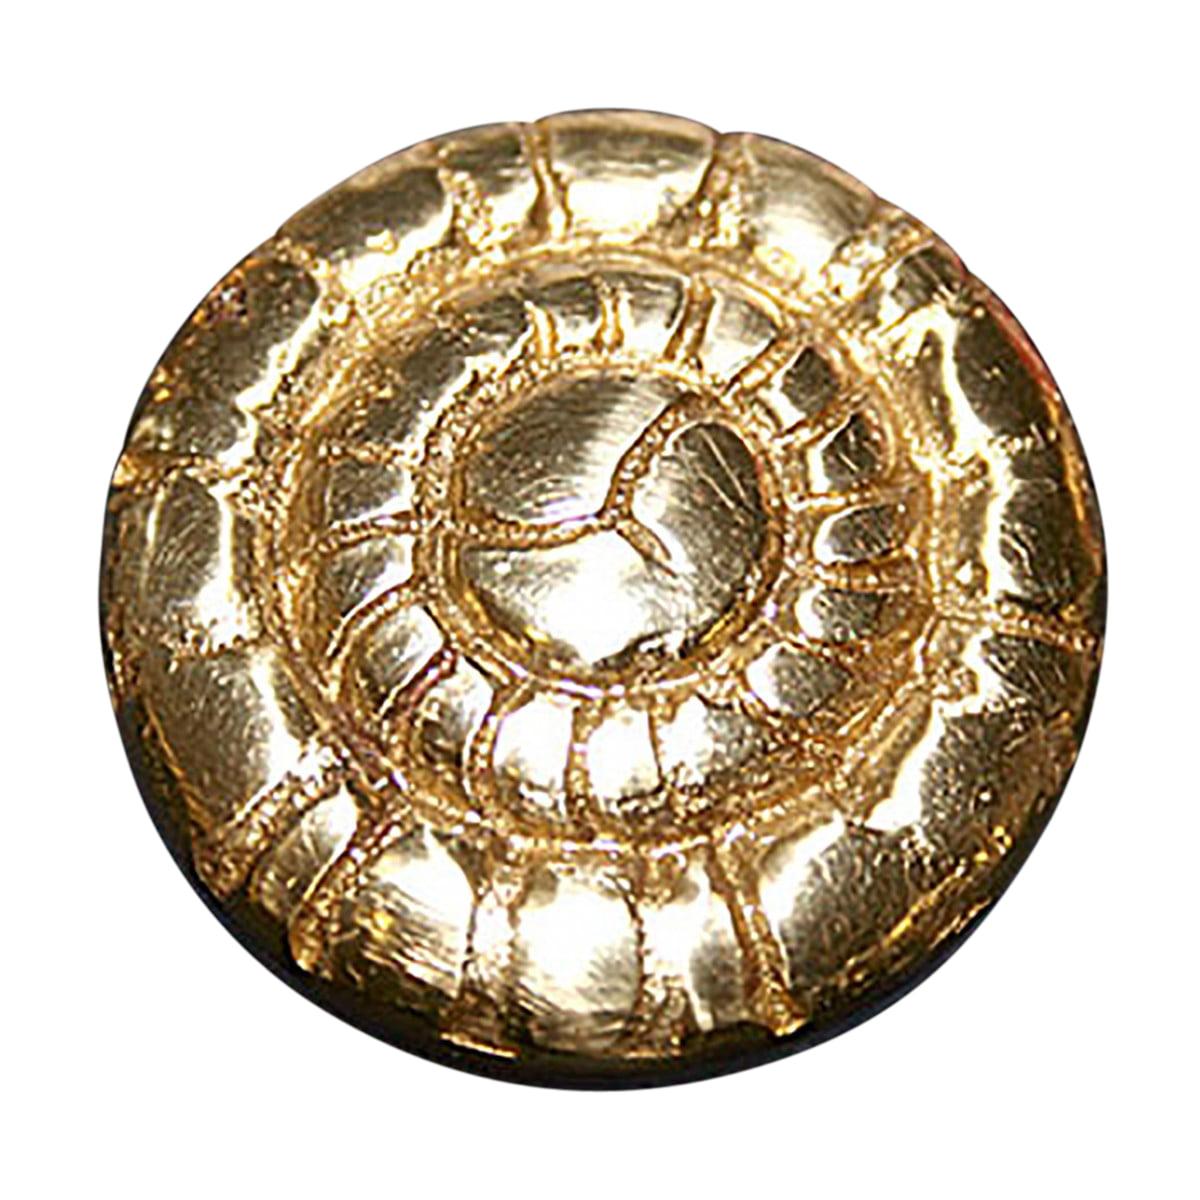 "2"" Tubing End Plug Decorative Cap Lifetime Solid Brass | Renovator's Supply"